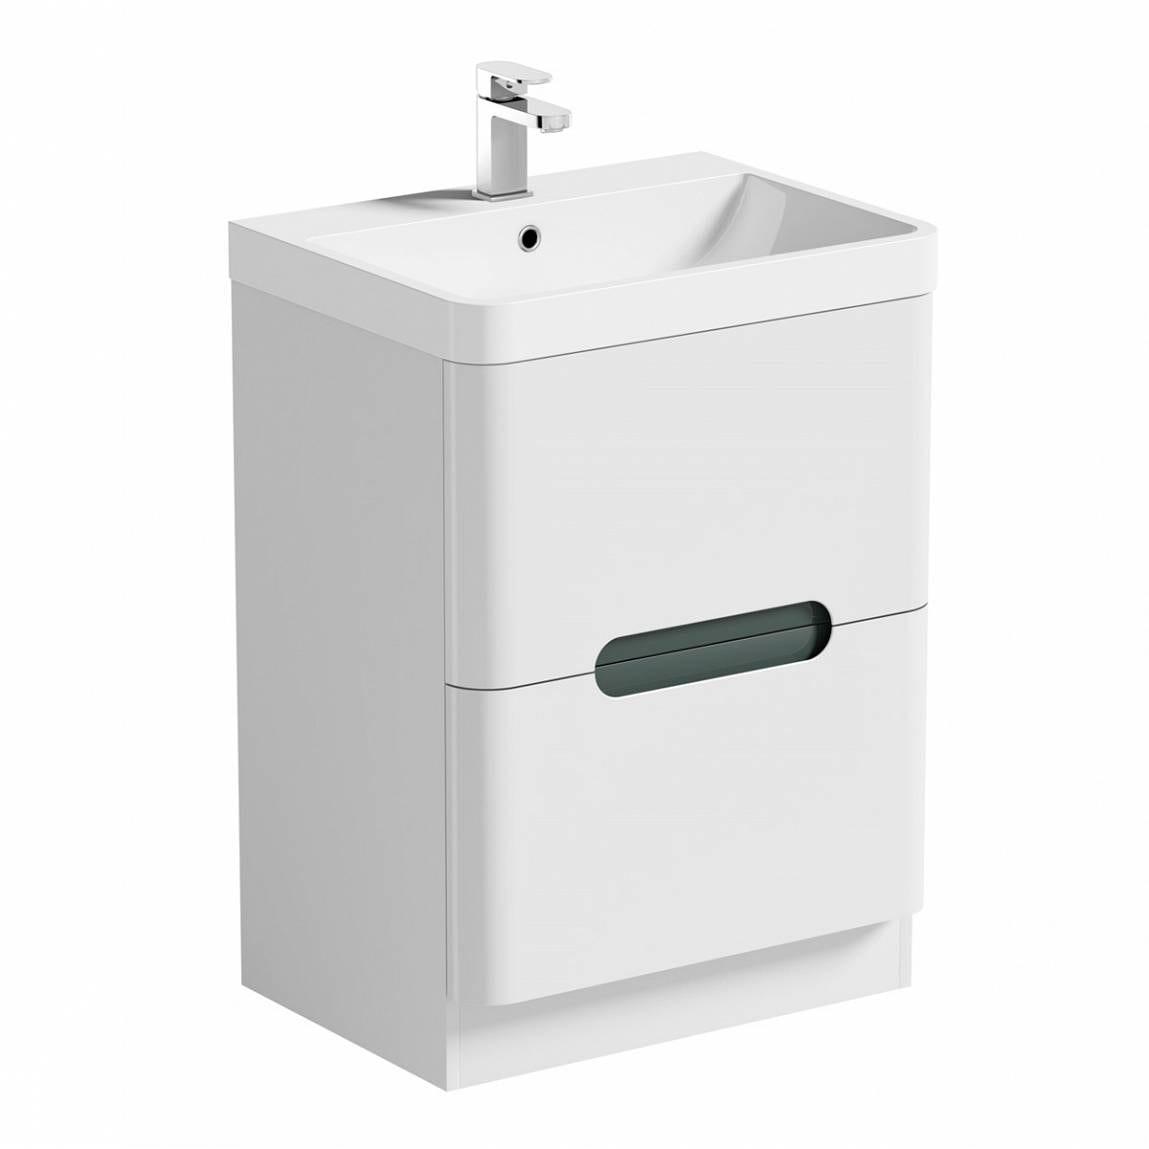 Mode Ellis slate vanity drawer unit and basin 600mm